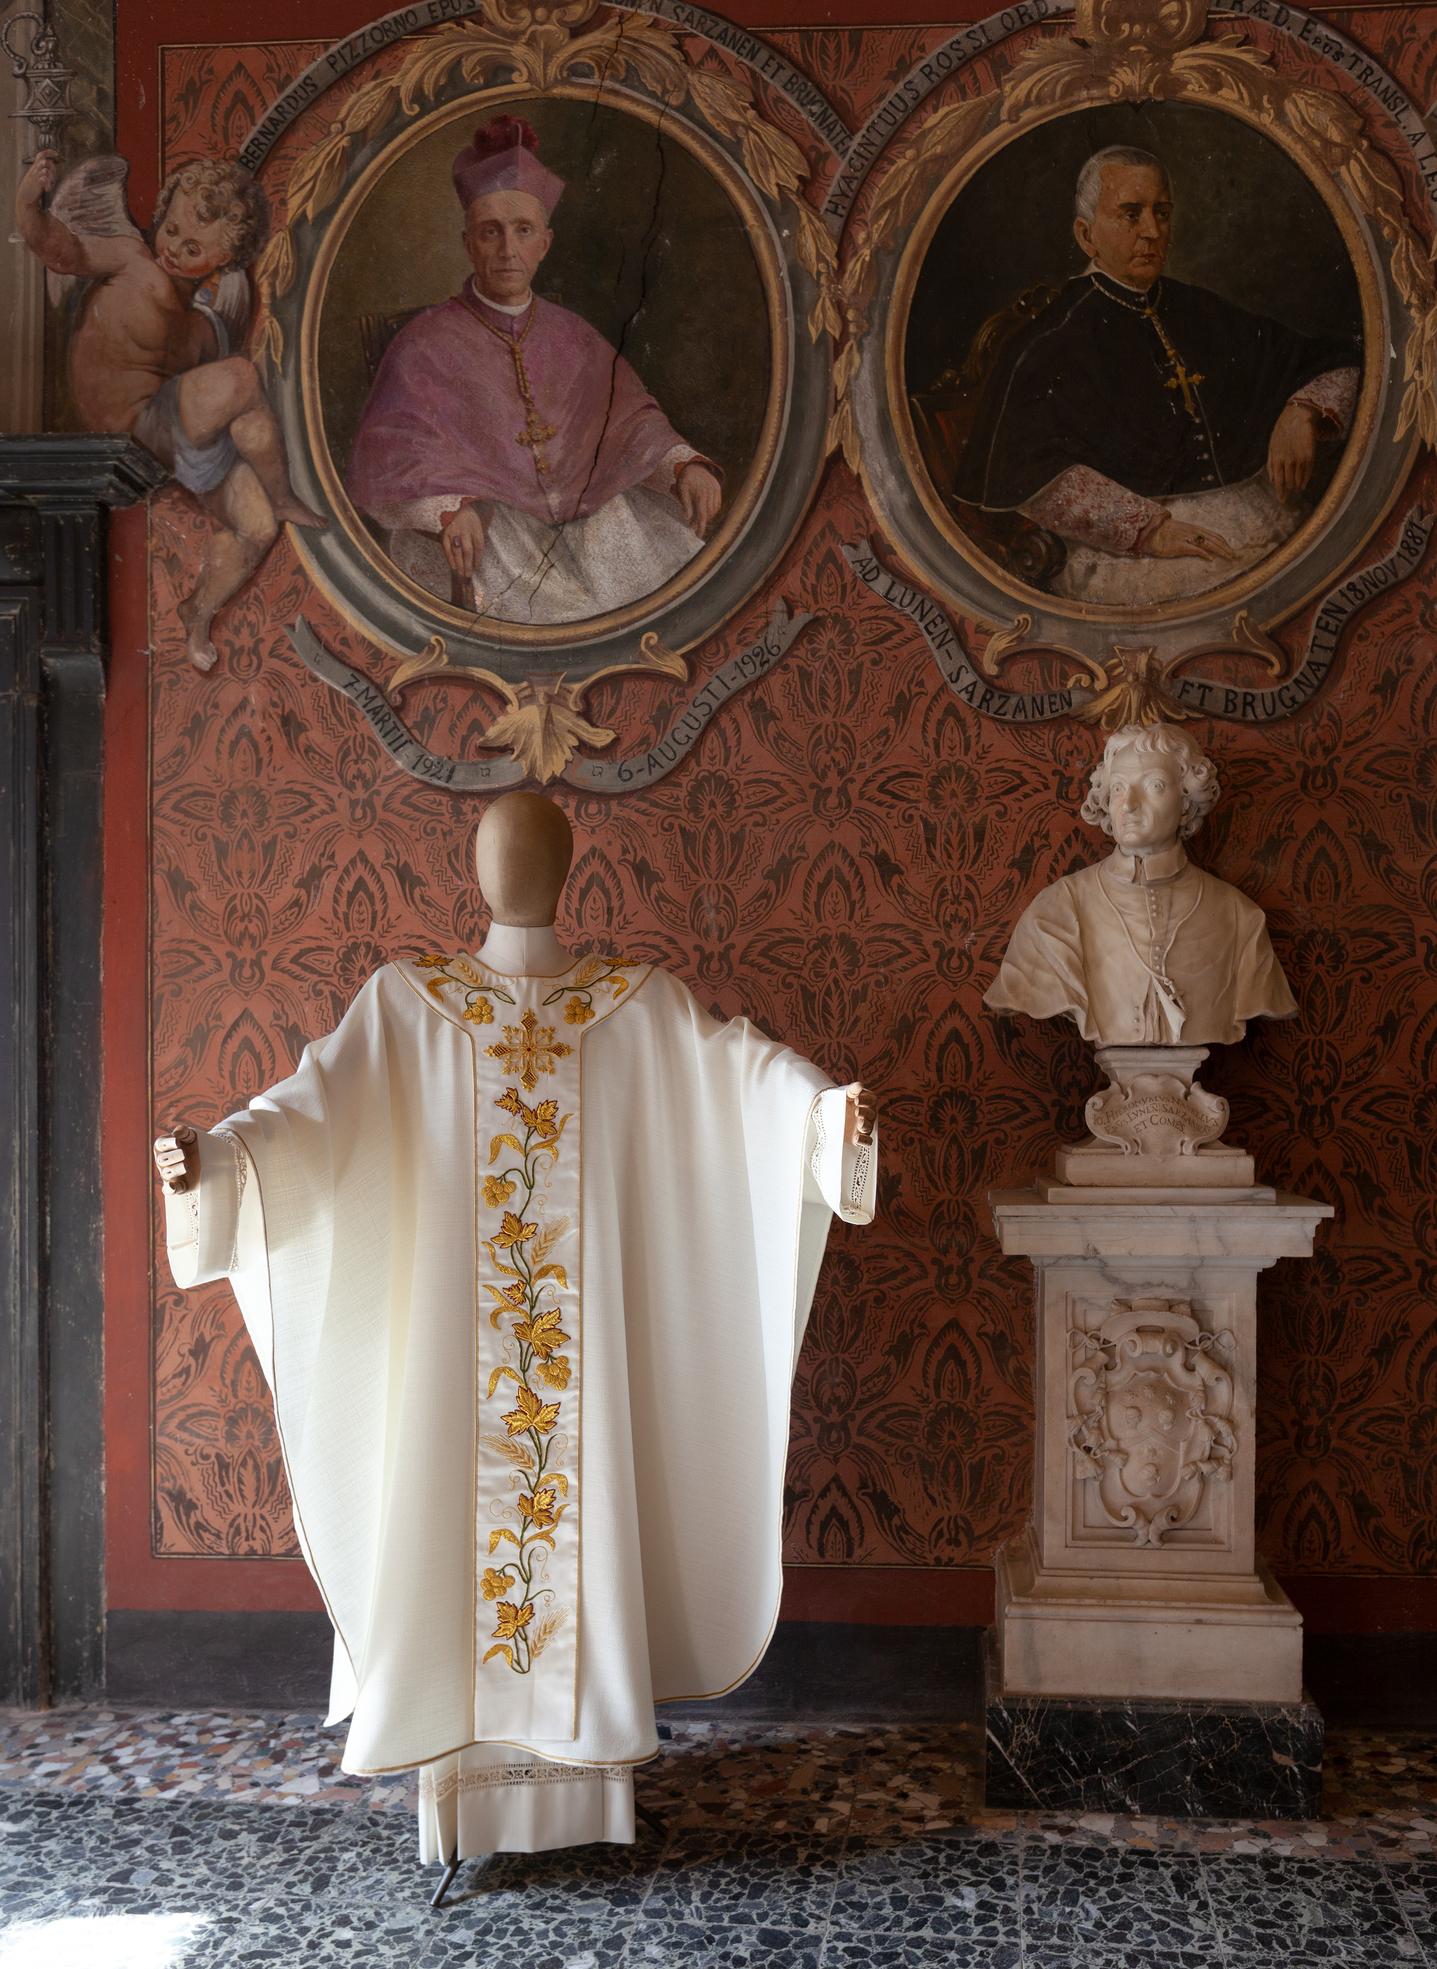 casula per ordinazione sacerdotale ricam